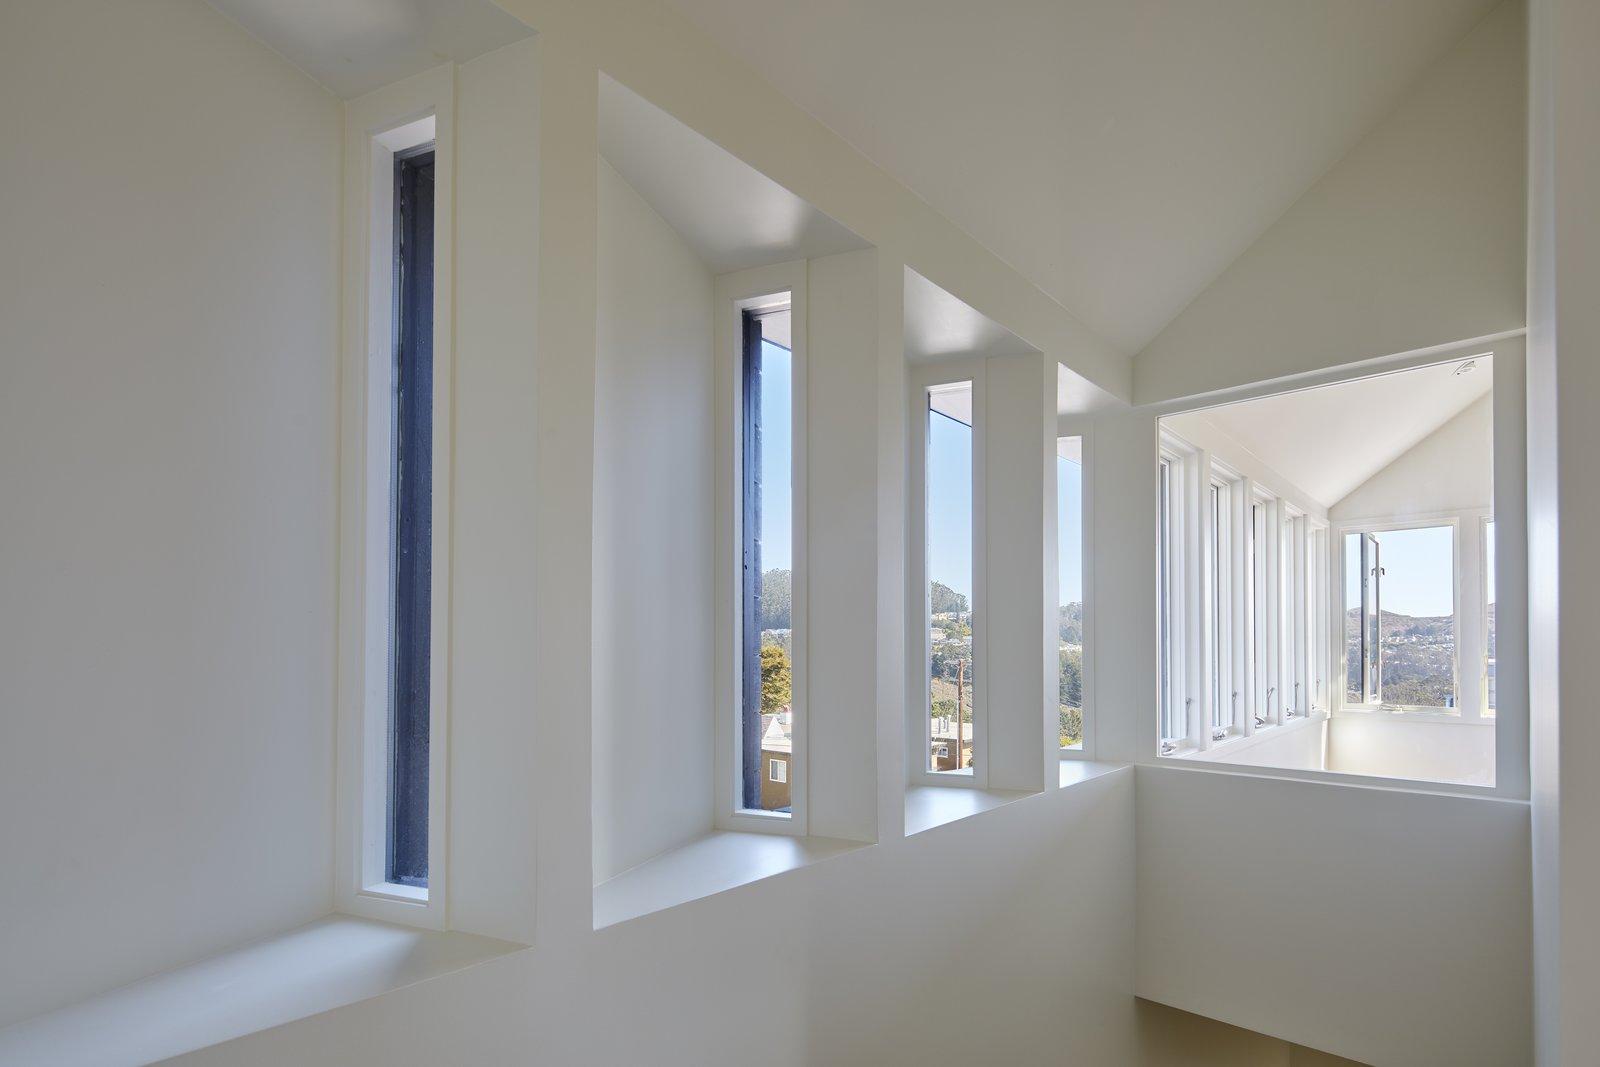 SAWtooth Window A-to-Z House by Spiegel Aihara Workshop